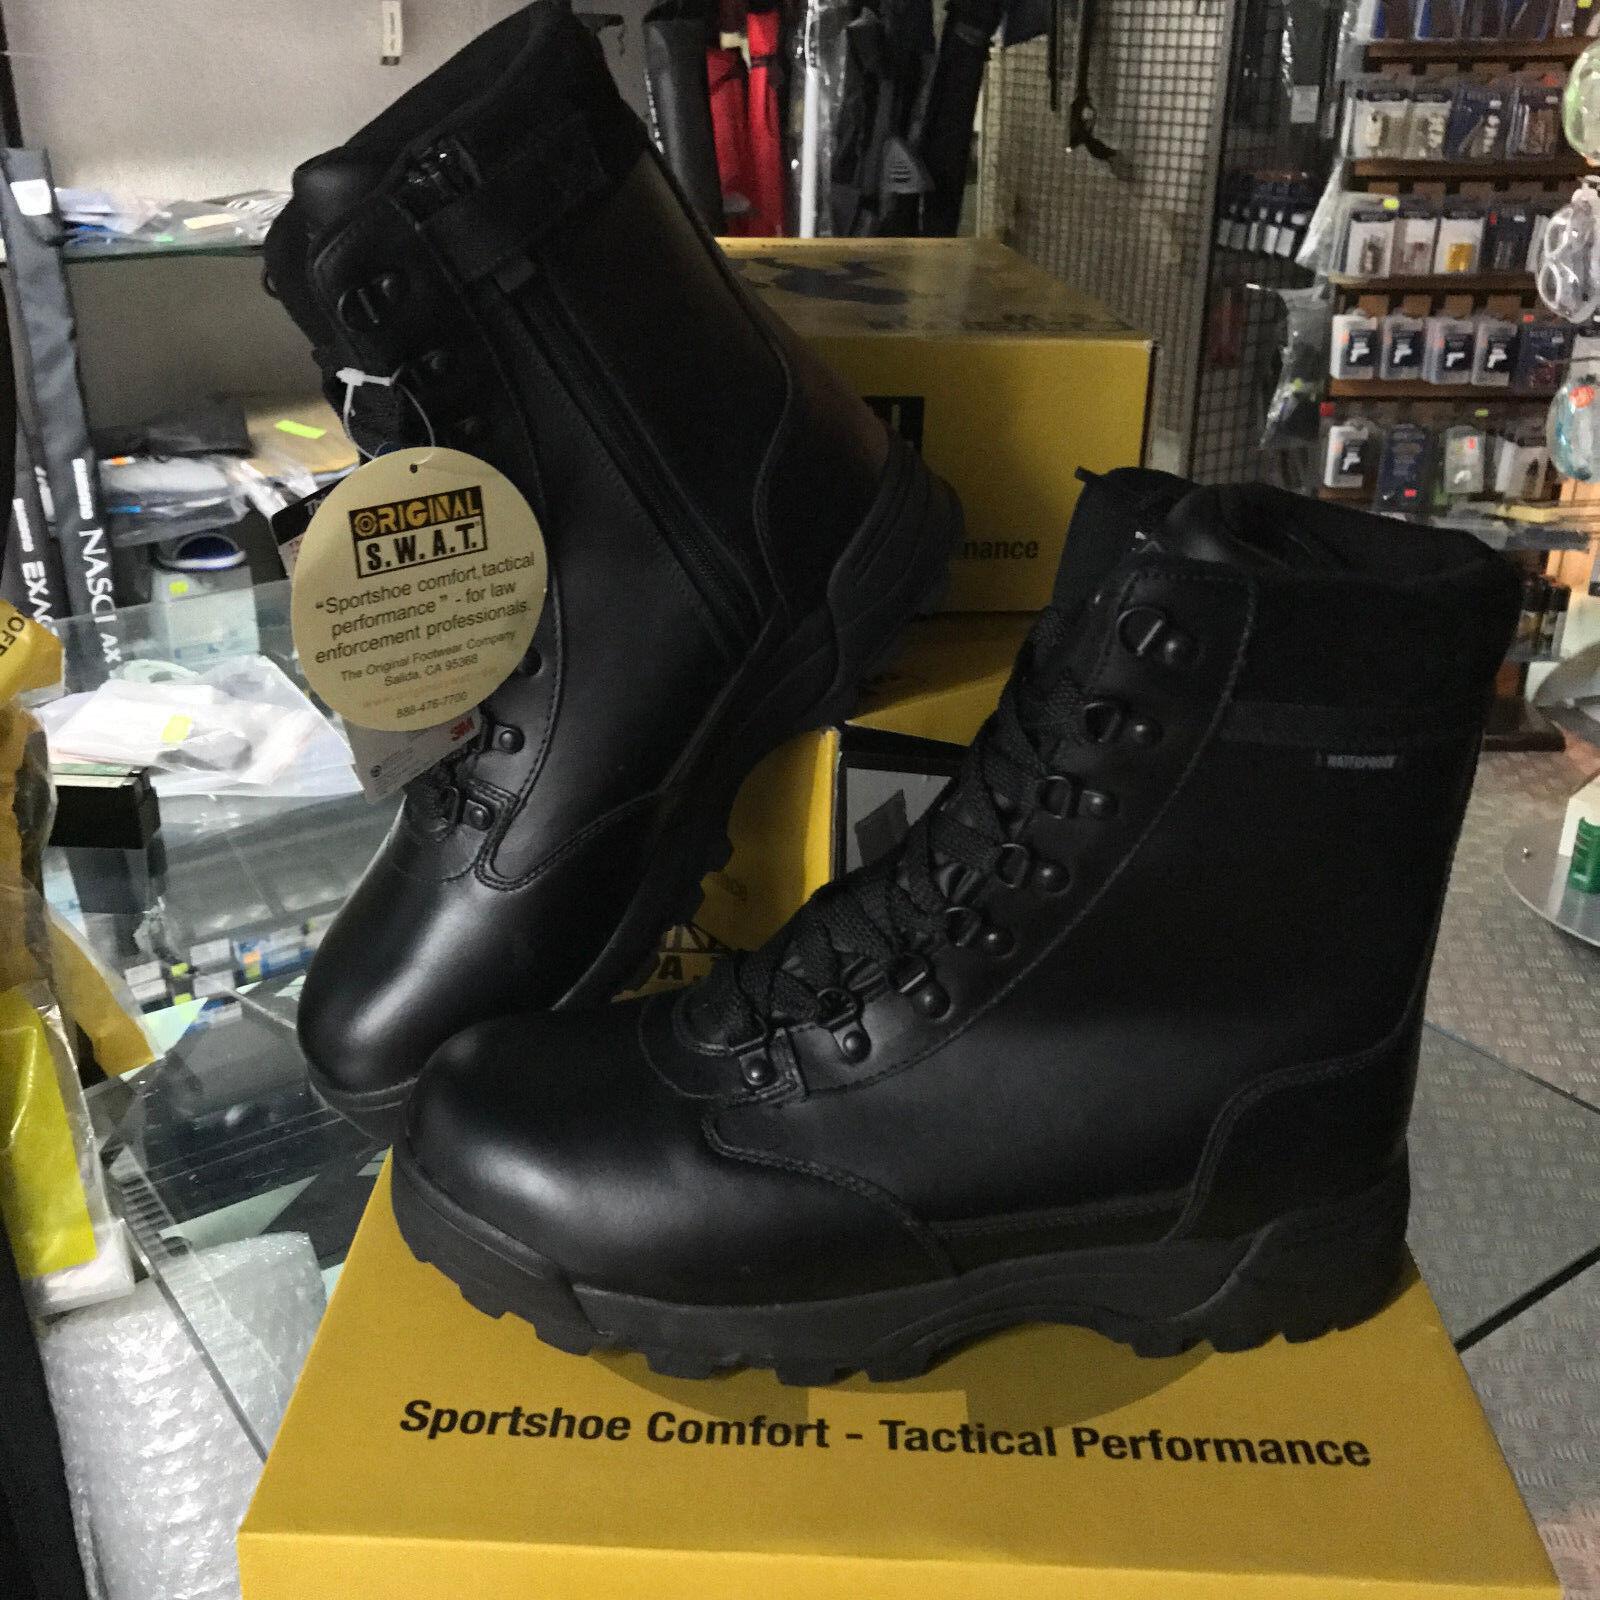 ORIGINAL SWAT Anfibi 39 1274 Leather WATERPROOF zip Classic 9